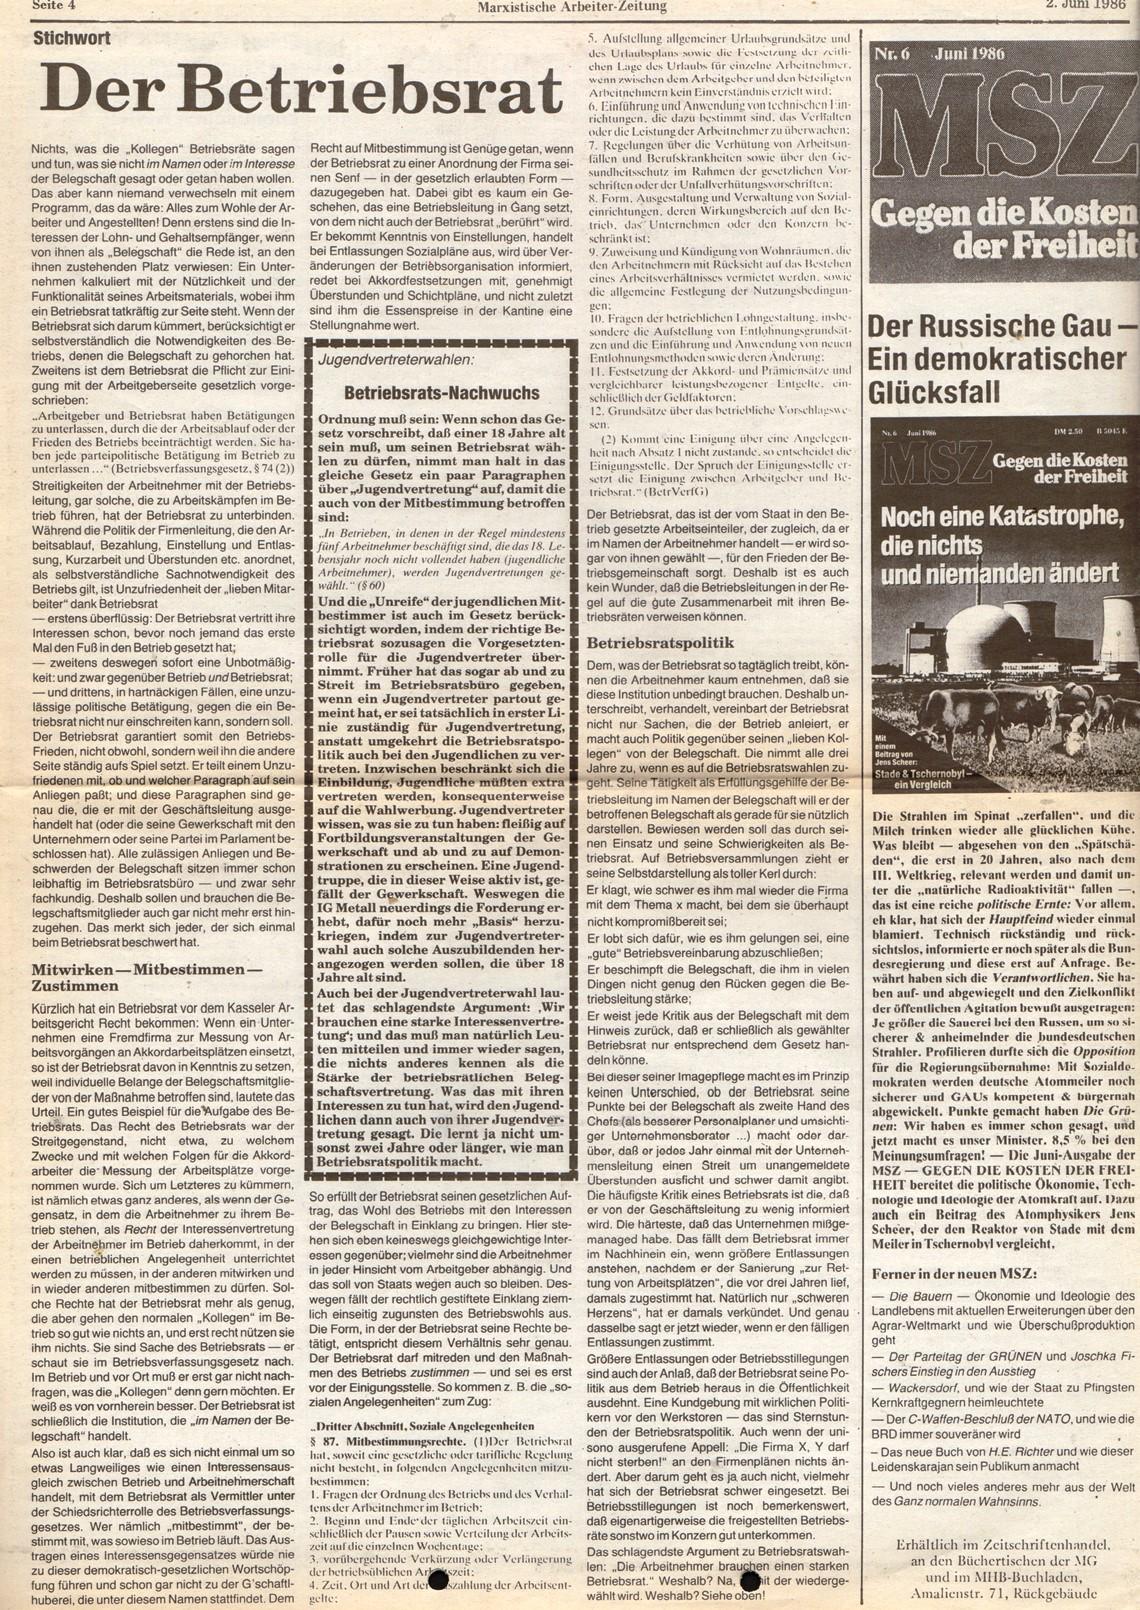 Muenchen_MG_MAZ_Lehrlinge_19860602_04